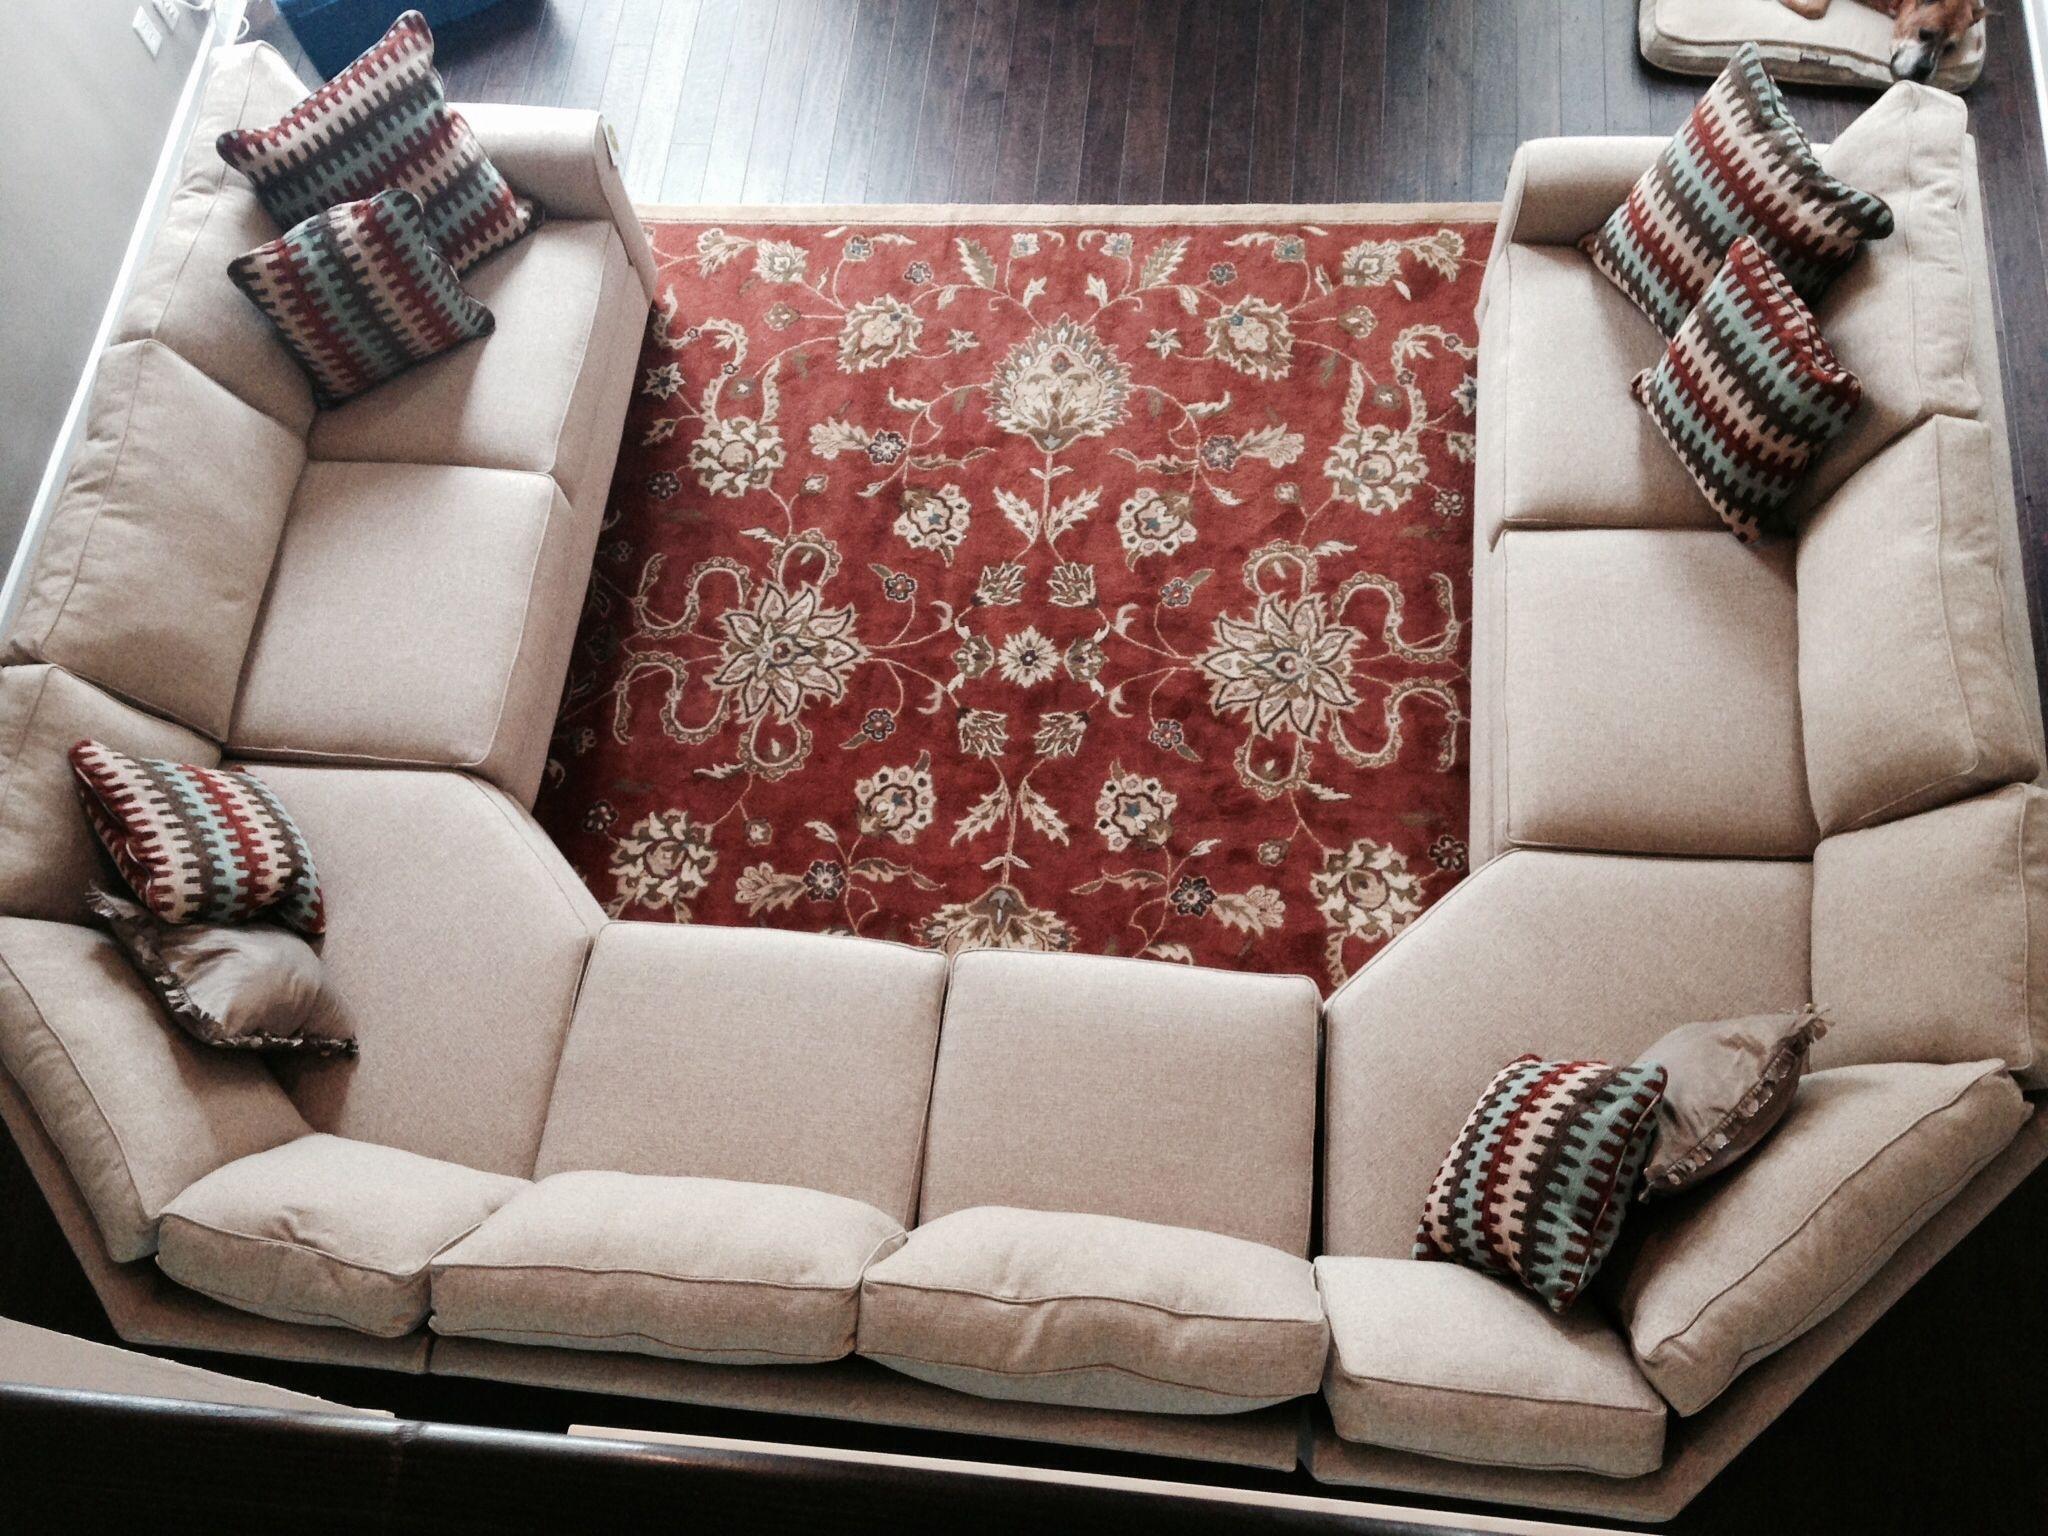 Cool U Shaped Sectional Sofas , Awesome U Shaped Sectional Sofas 44 For Blue U Shaped Sectionals (Image 3 of 10)